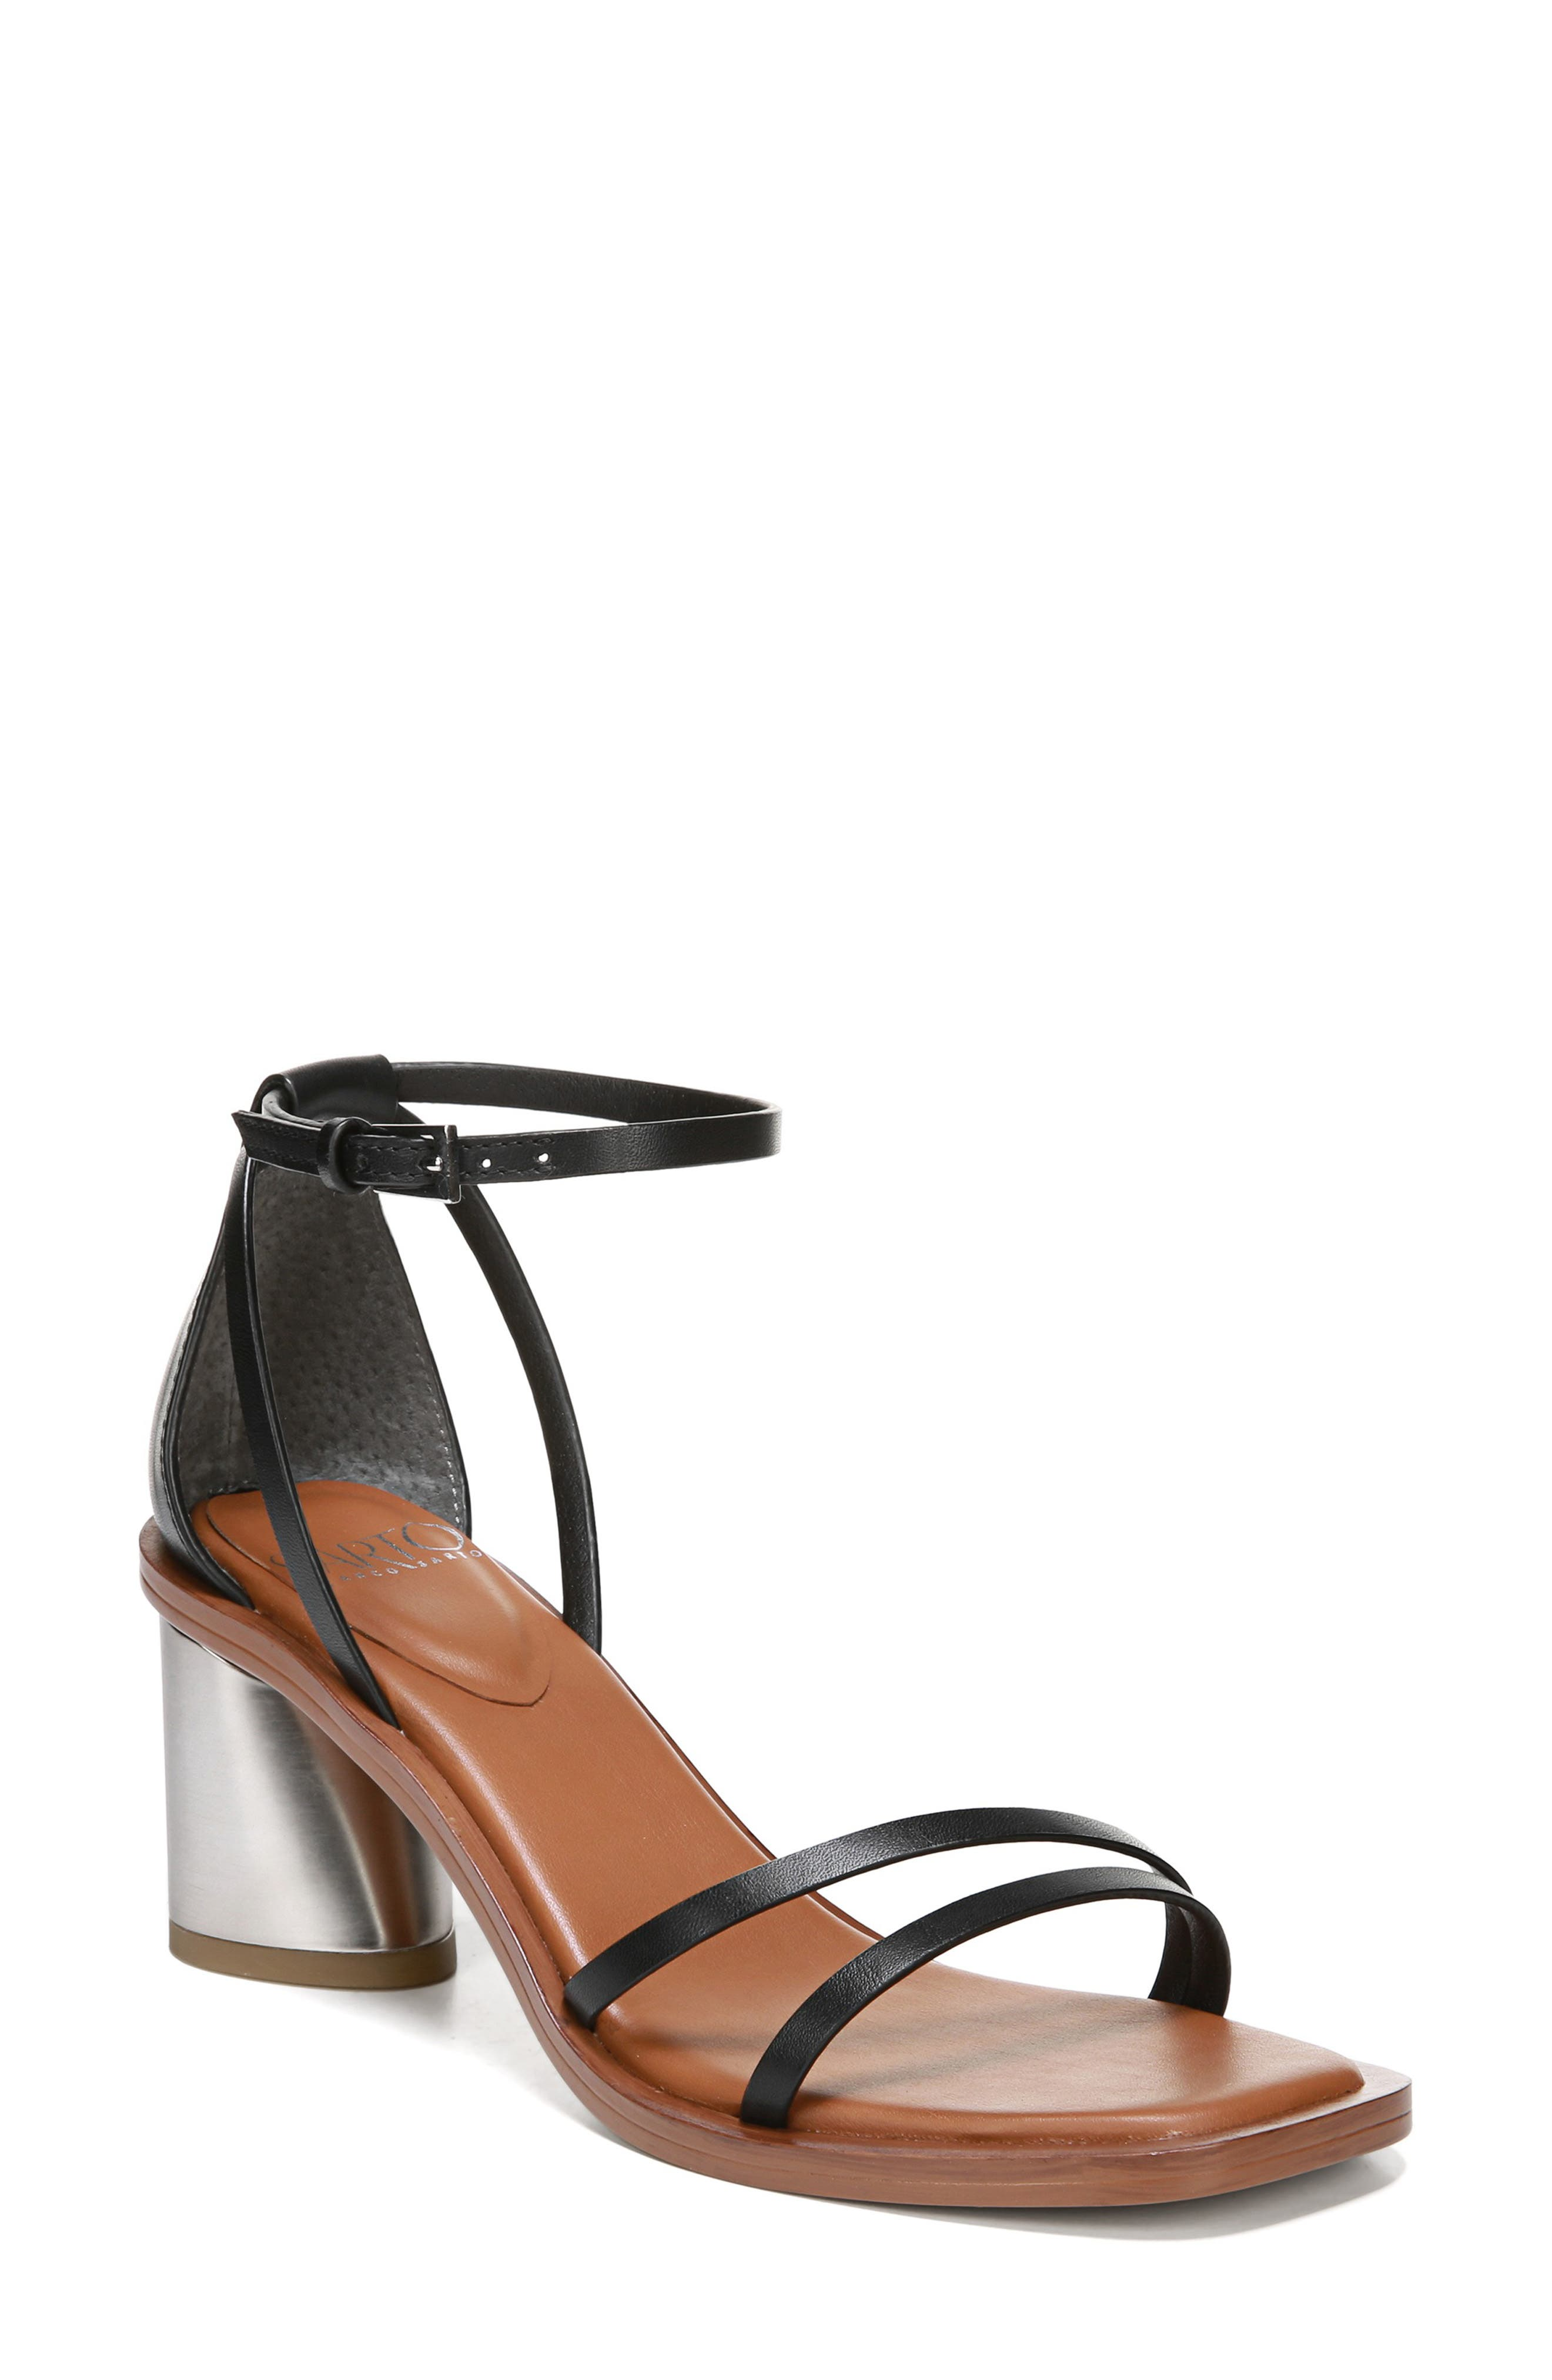 Sarto By Franco Sarto A-Ronelle Ankle Strap Sandal, Black